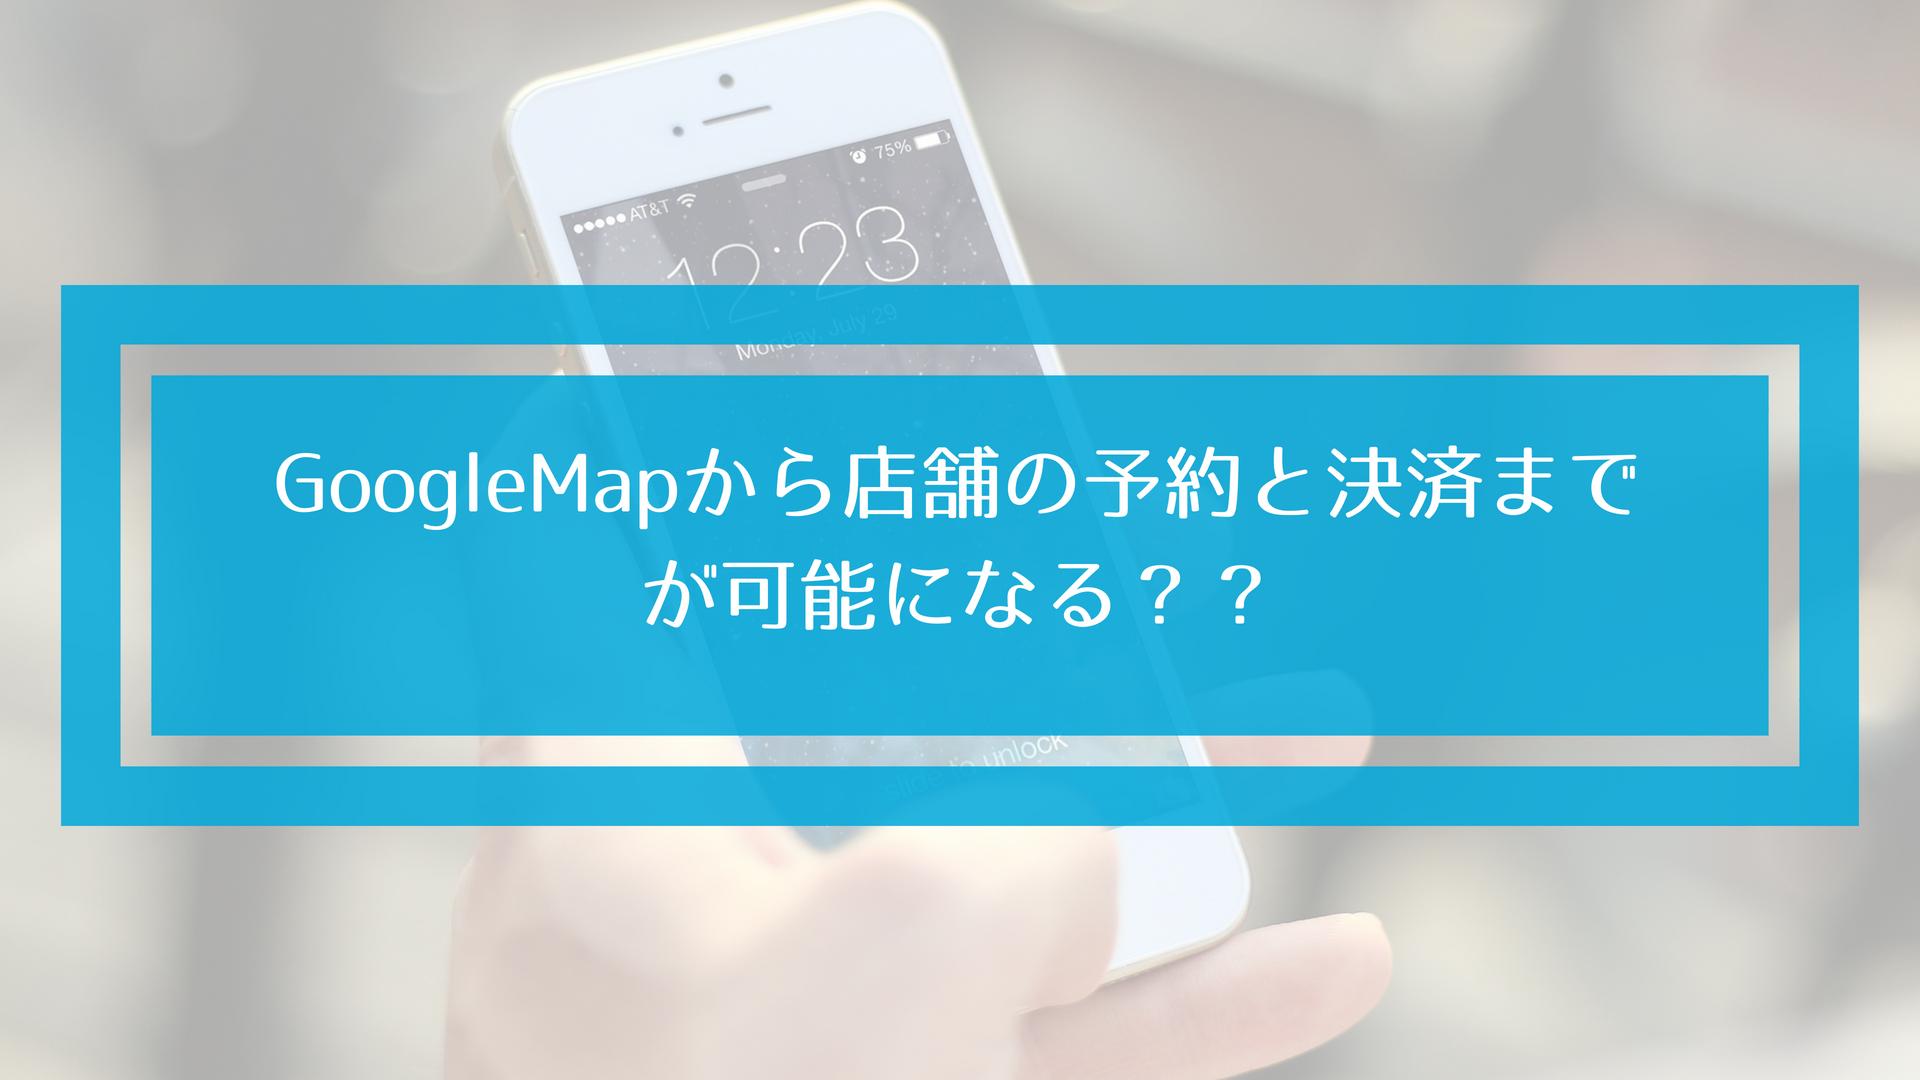 【MEO最新情報】GoogleMapから店舗の予約や決済が可能になる?